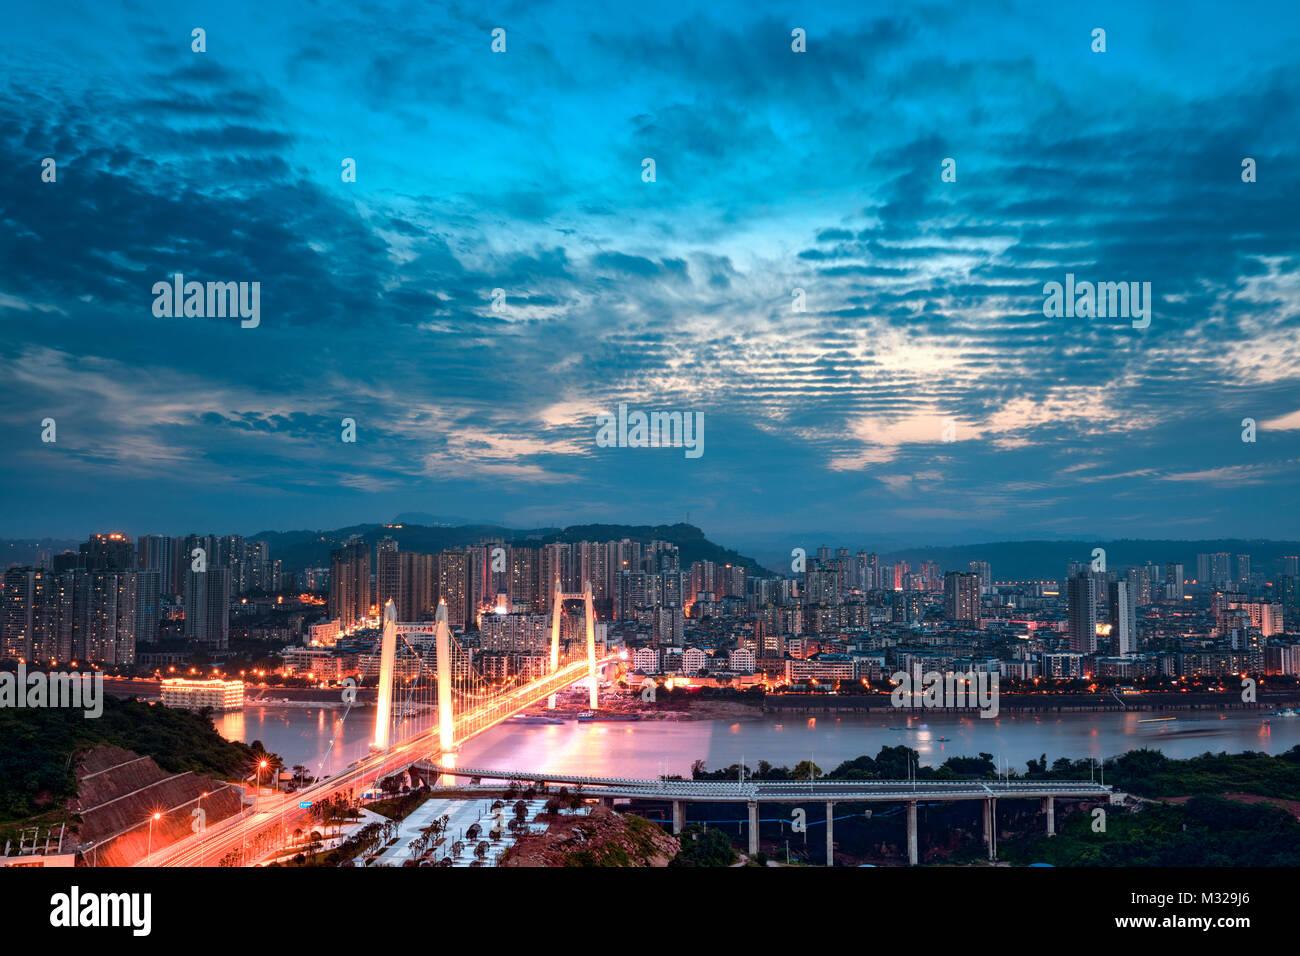 Night scene of urban architecture in Jiangjin District, Chongqing - Stock Image